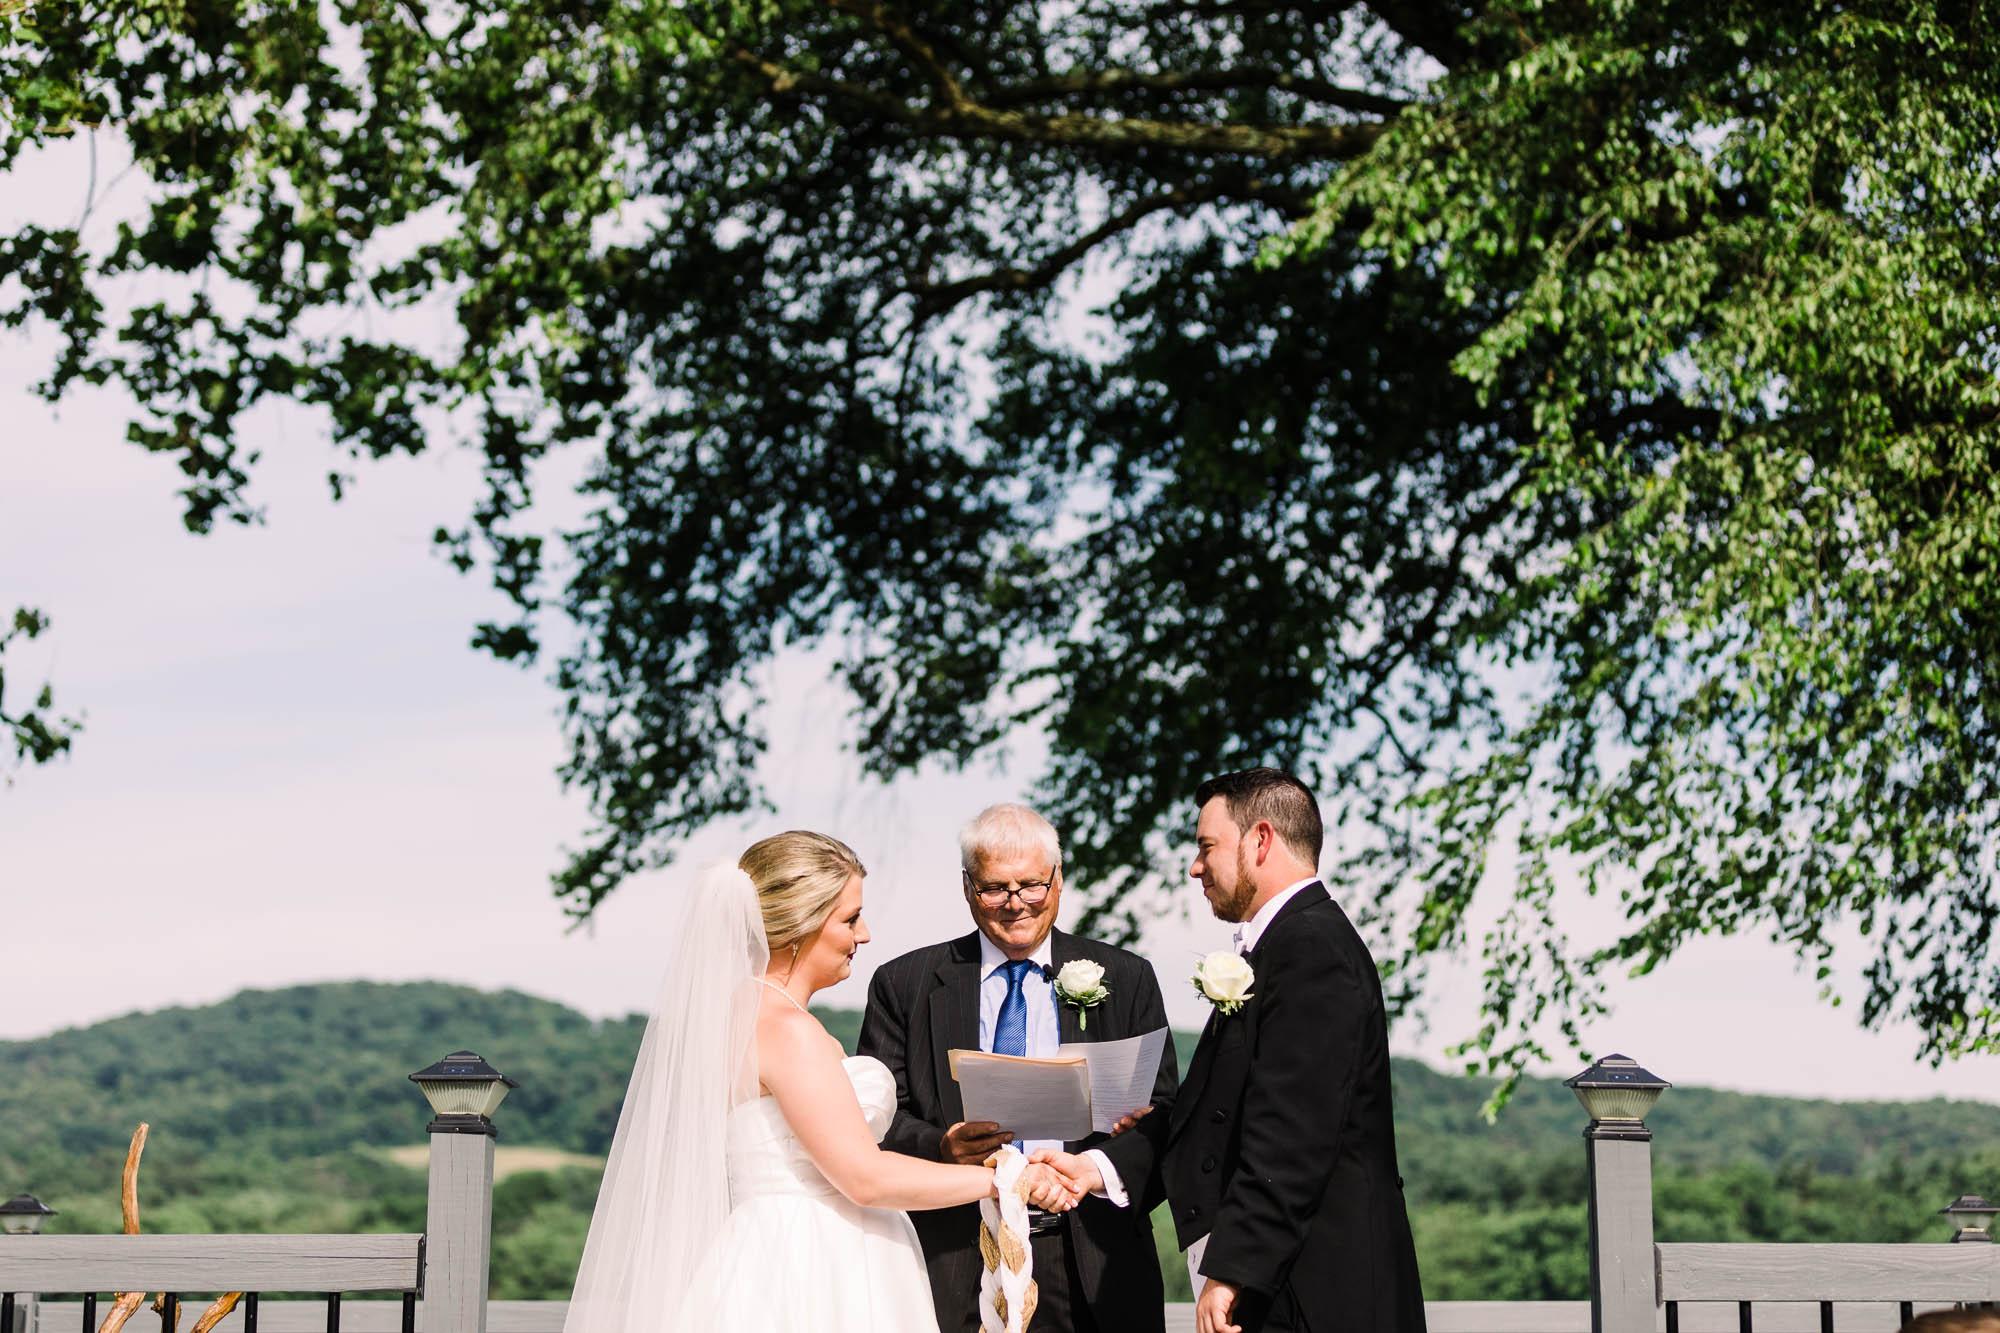 isle-of-que-wedding-3859.jpg